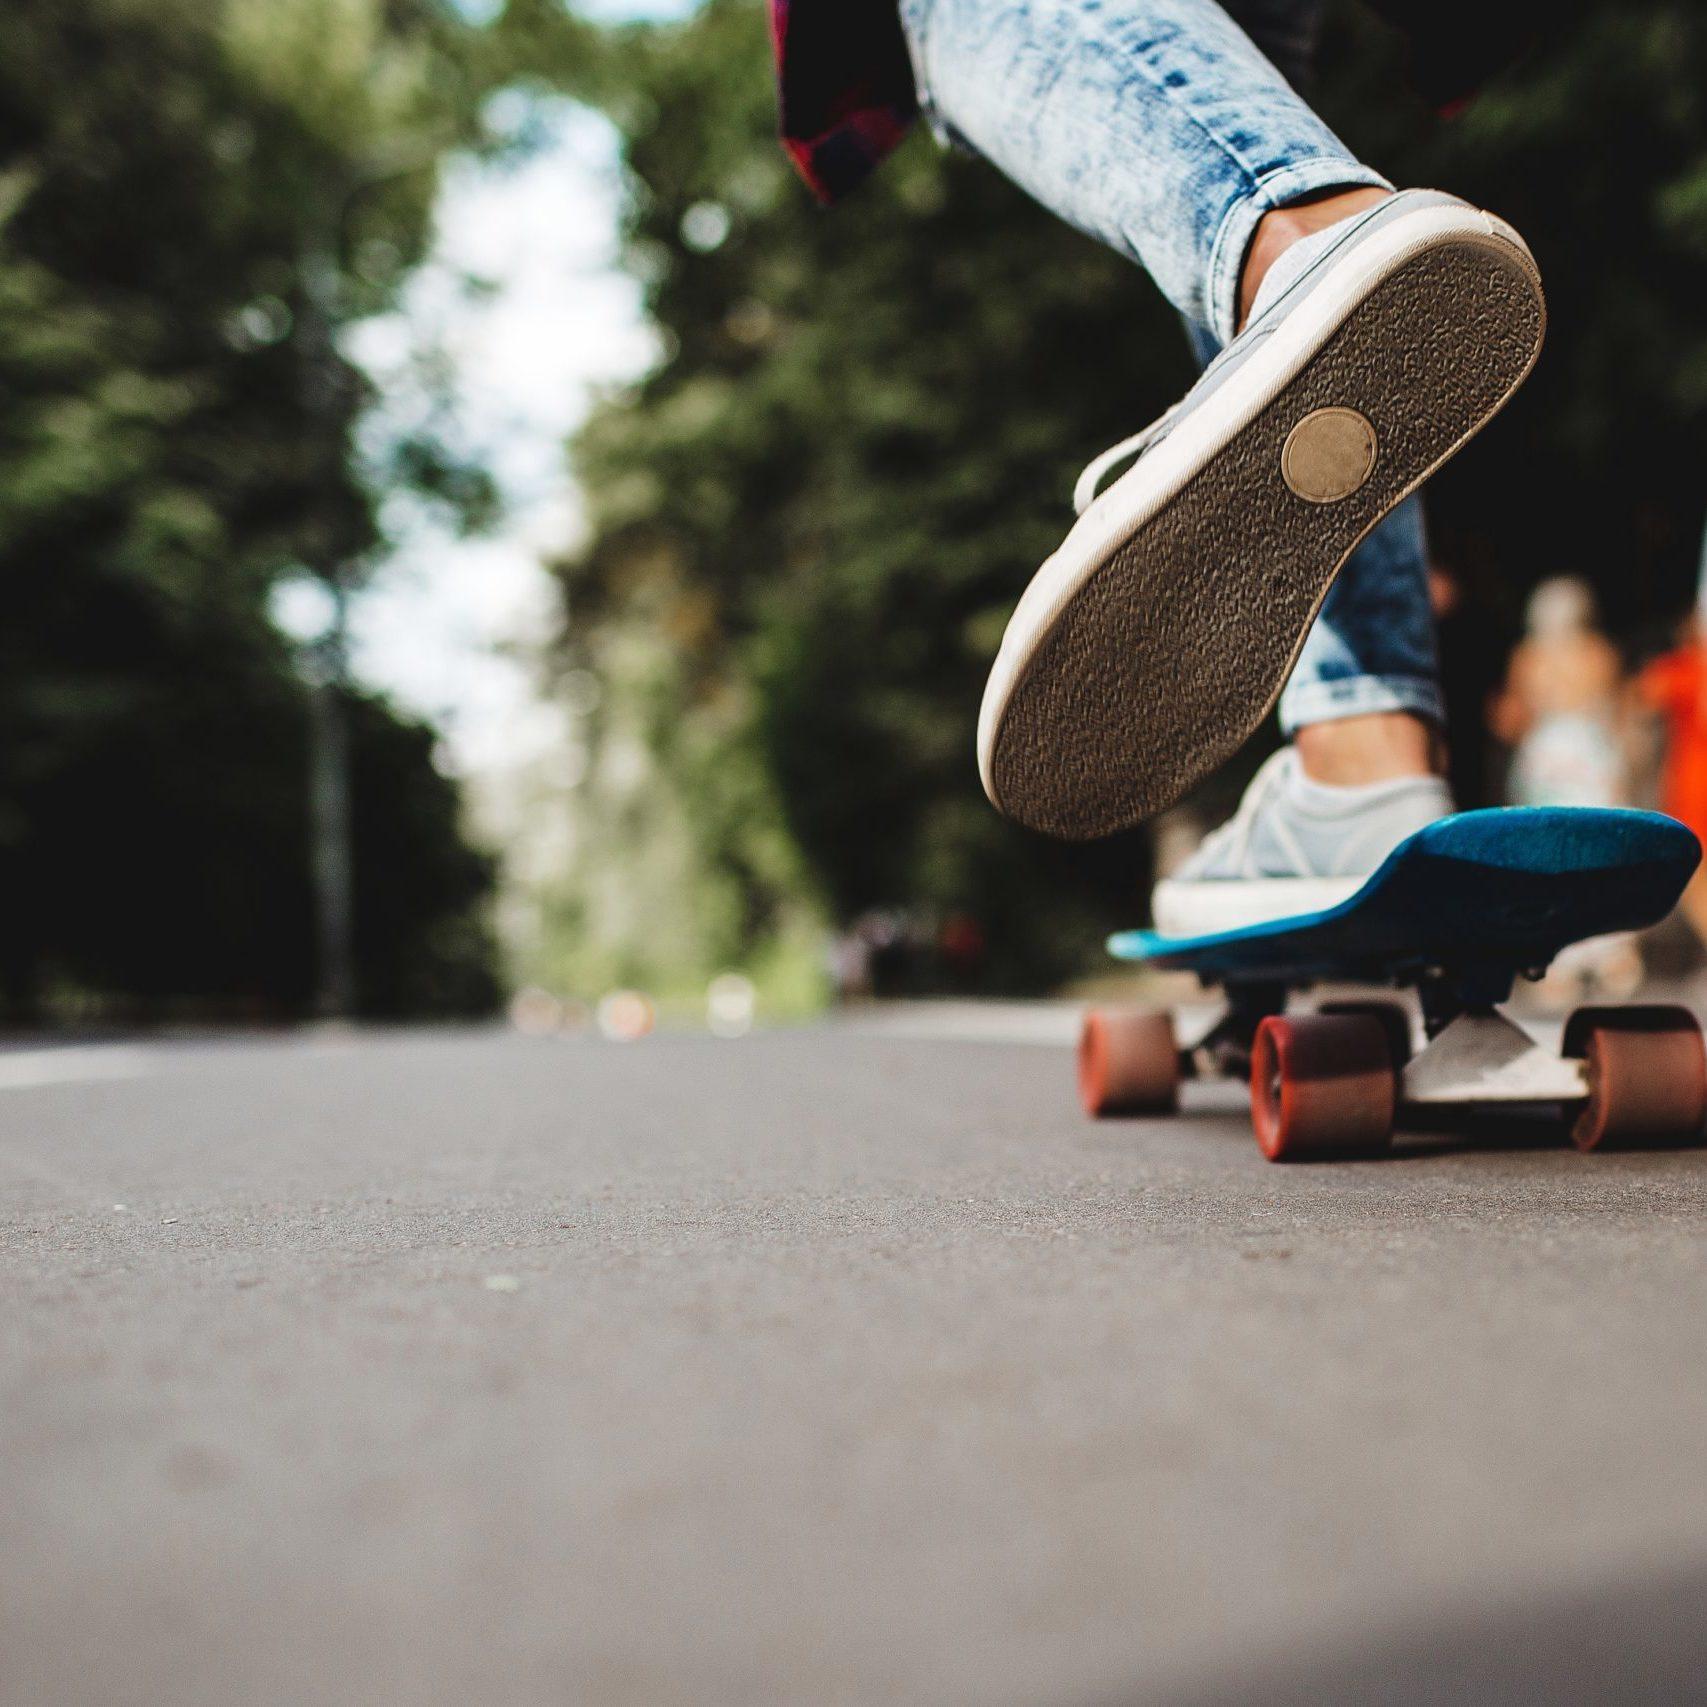 girl riding a skateboard in a city park